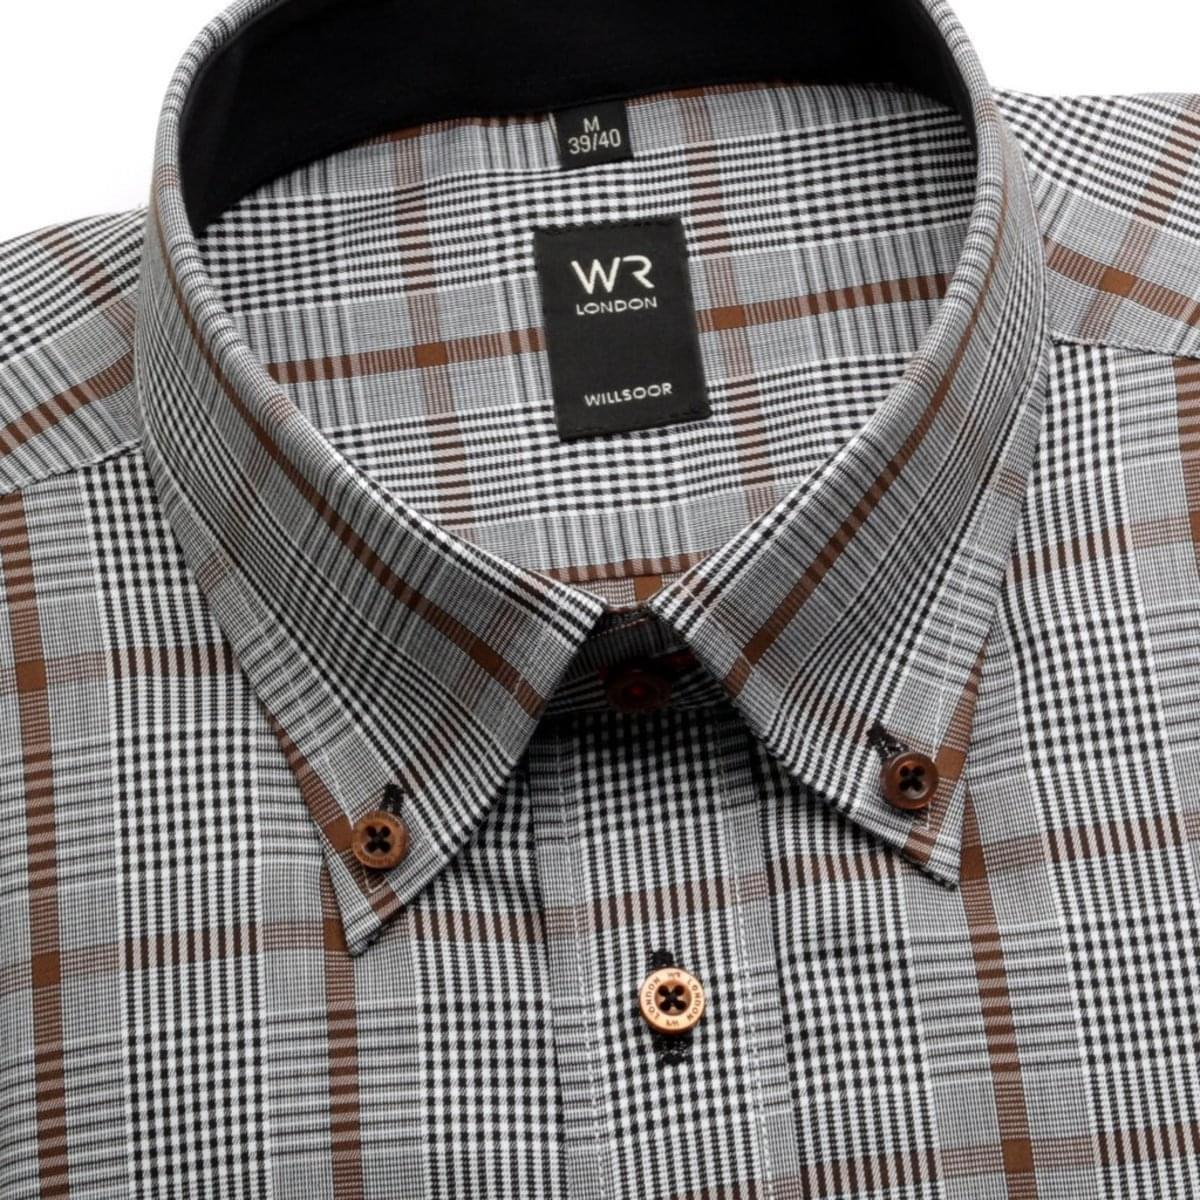 Willsoor Pánská košile WR London (výška 176-182) 1926 176-182 / M (39/40)